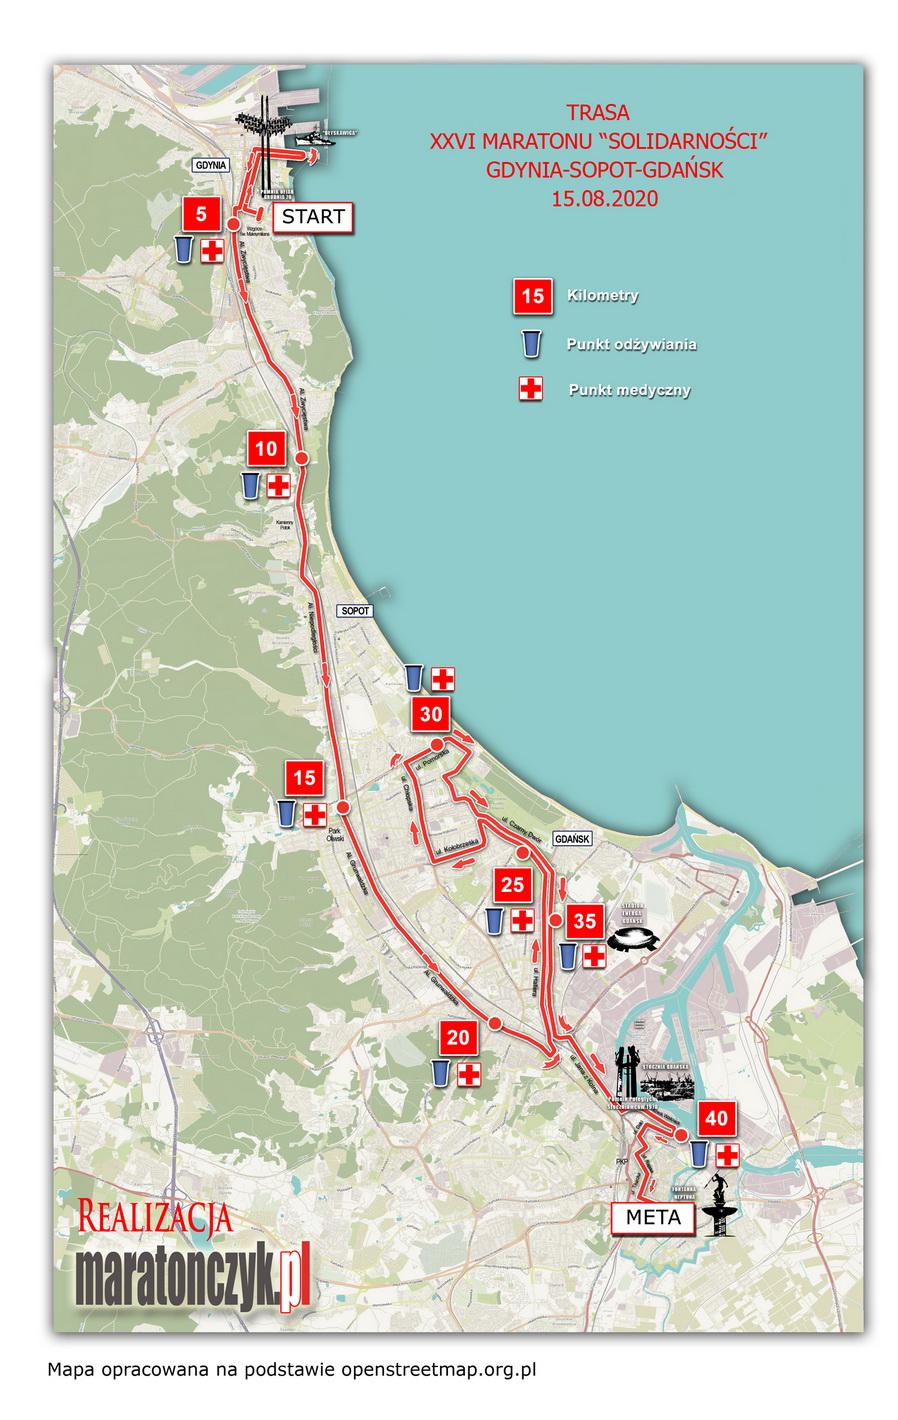 trasa gdansk maraton 2020